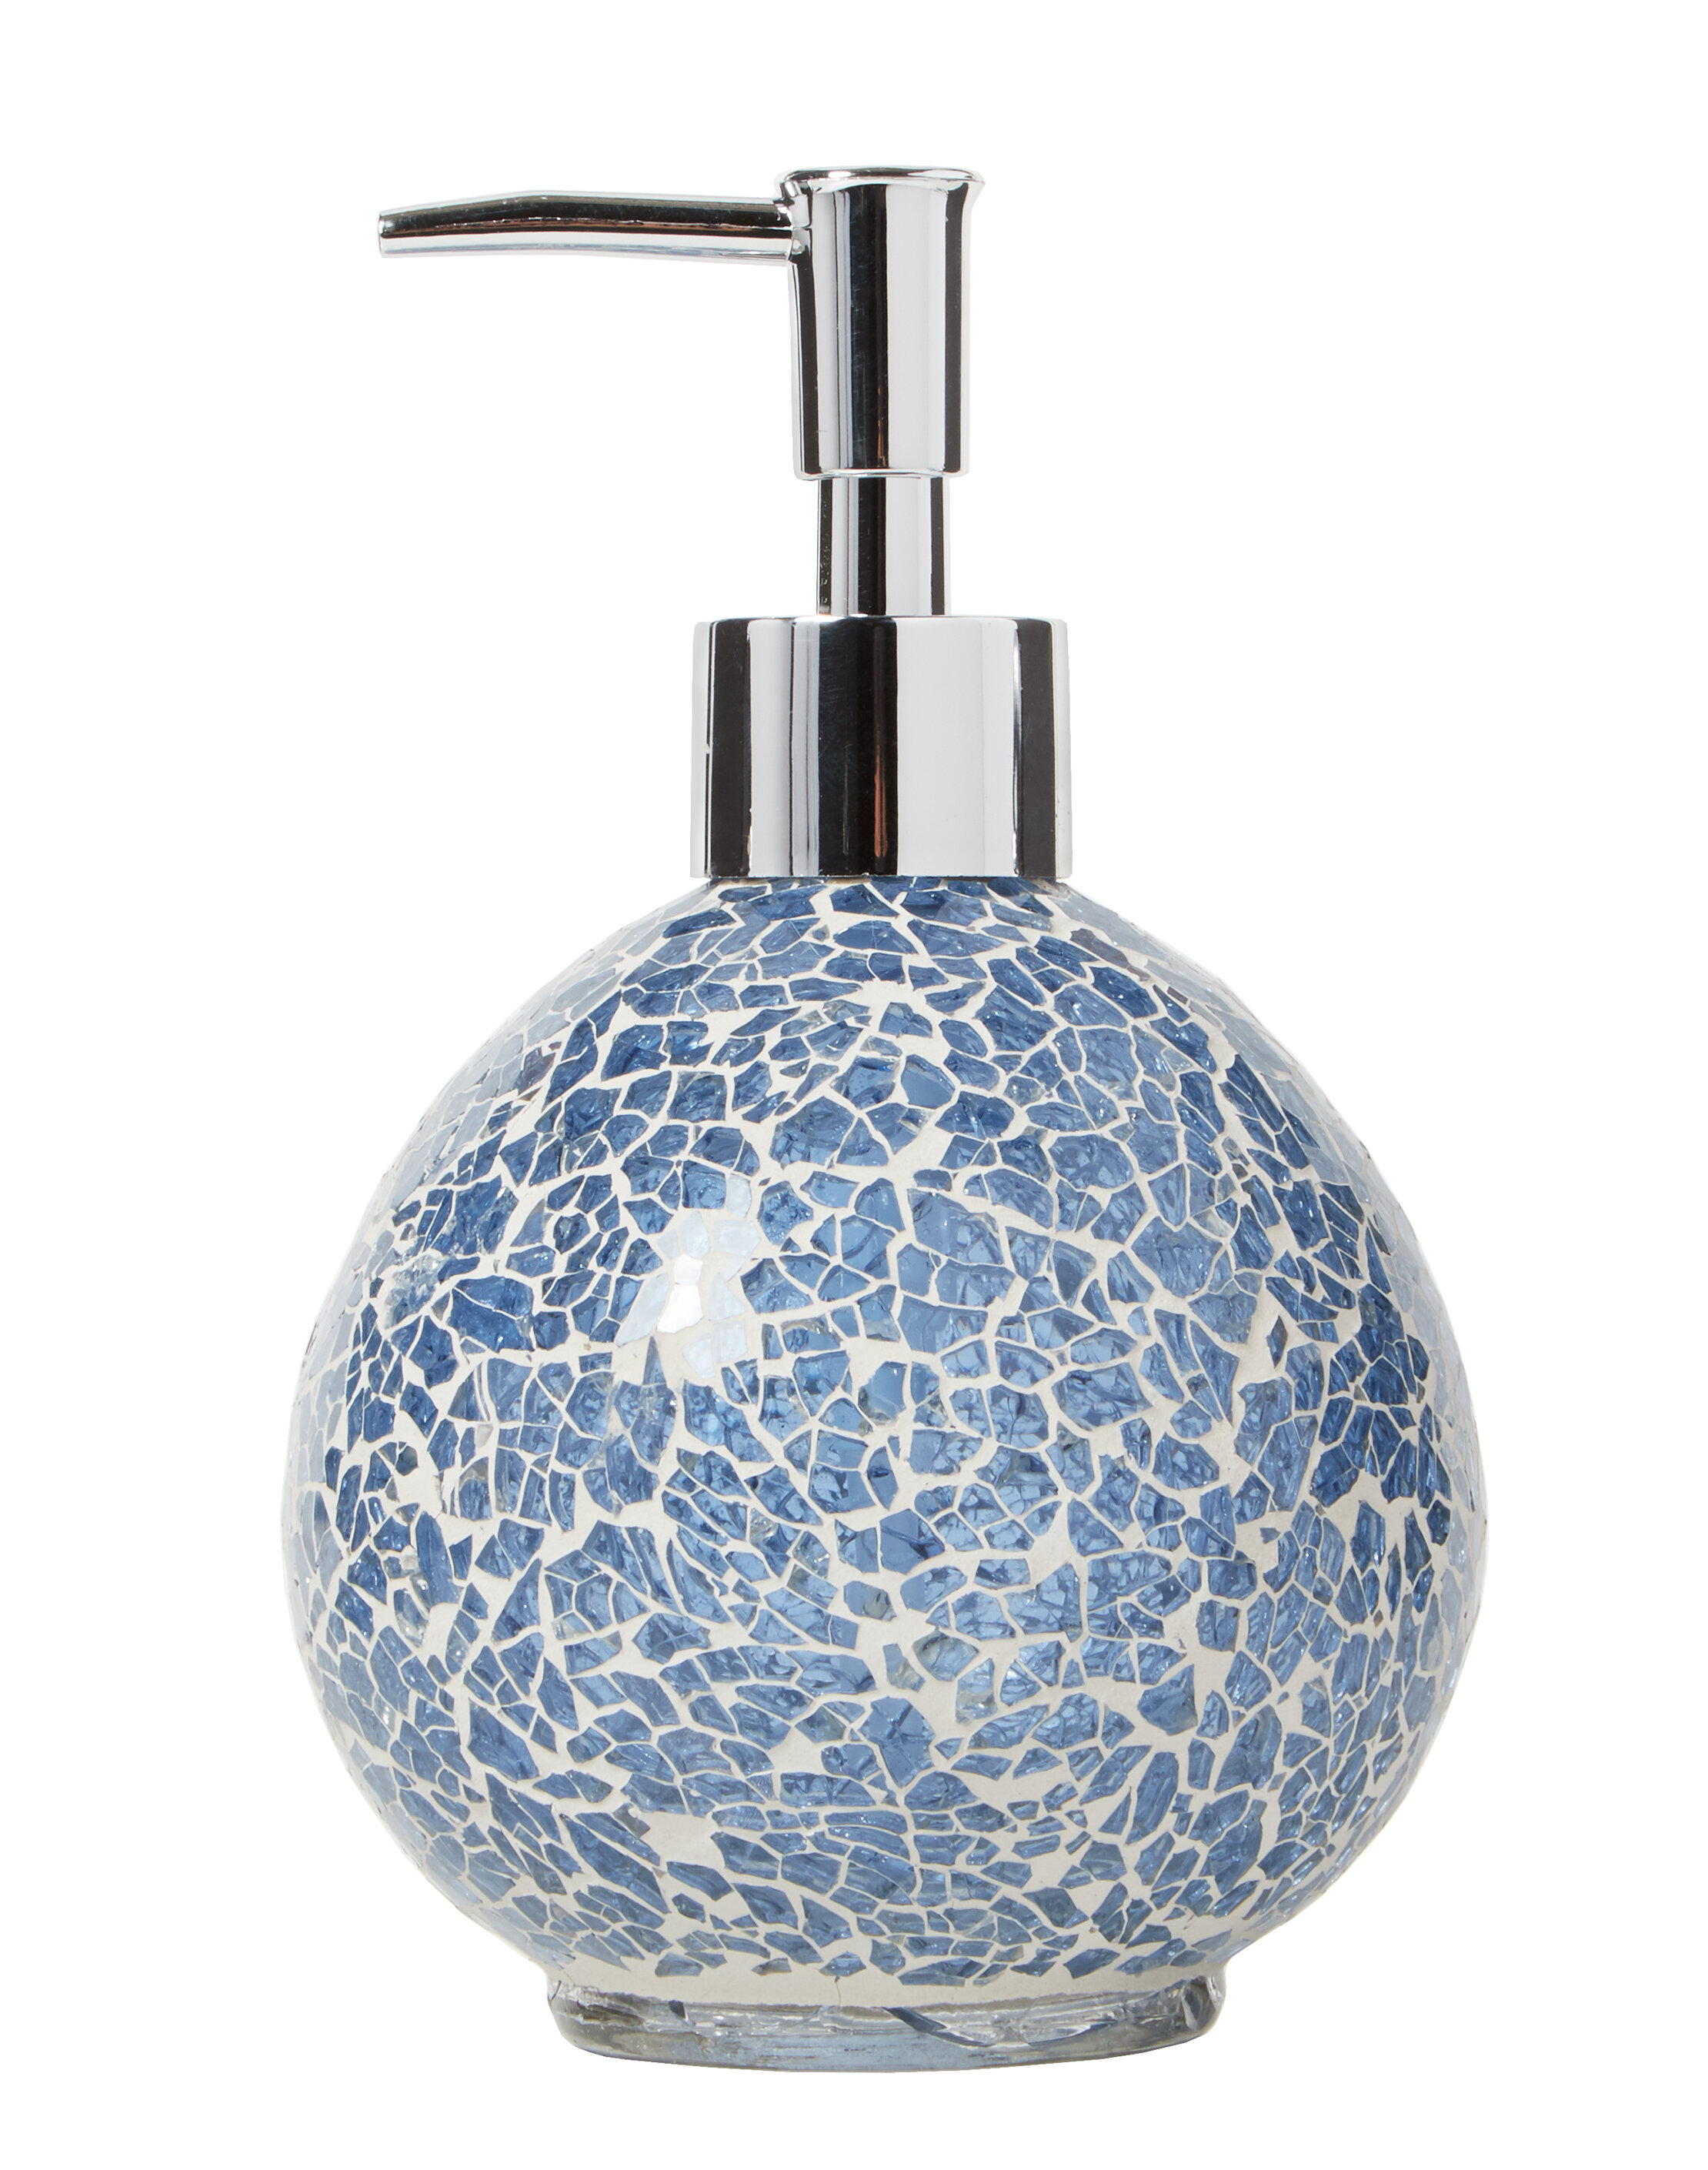 Bungalow Rose Moronta Bubbles Lotion Dispenser Reviews Wayfair